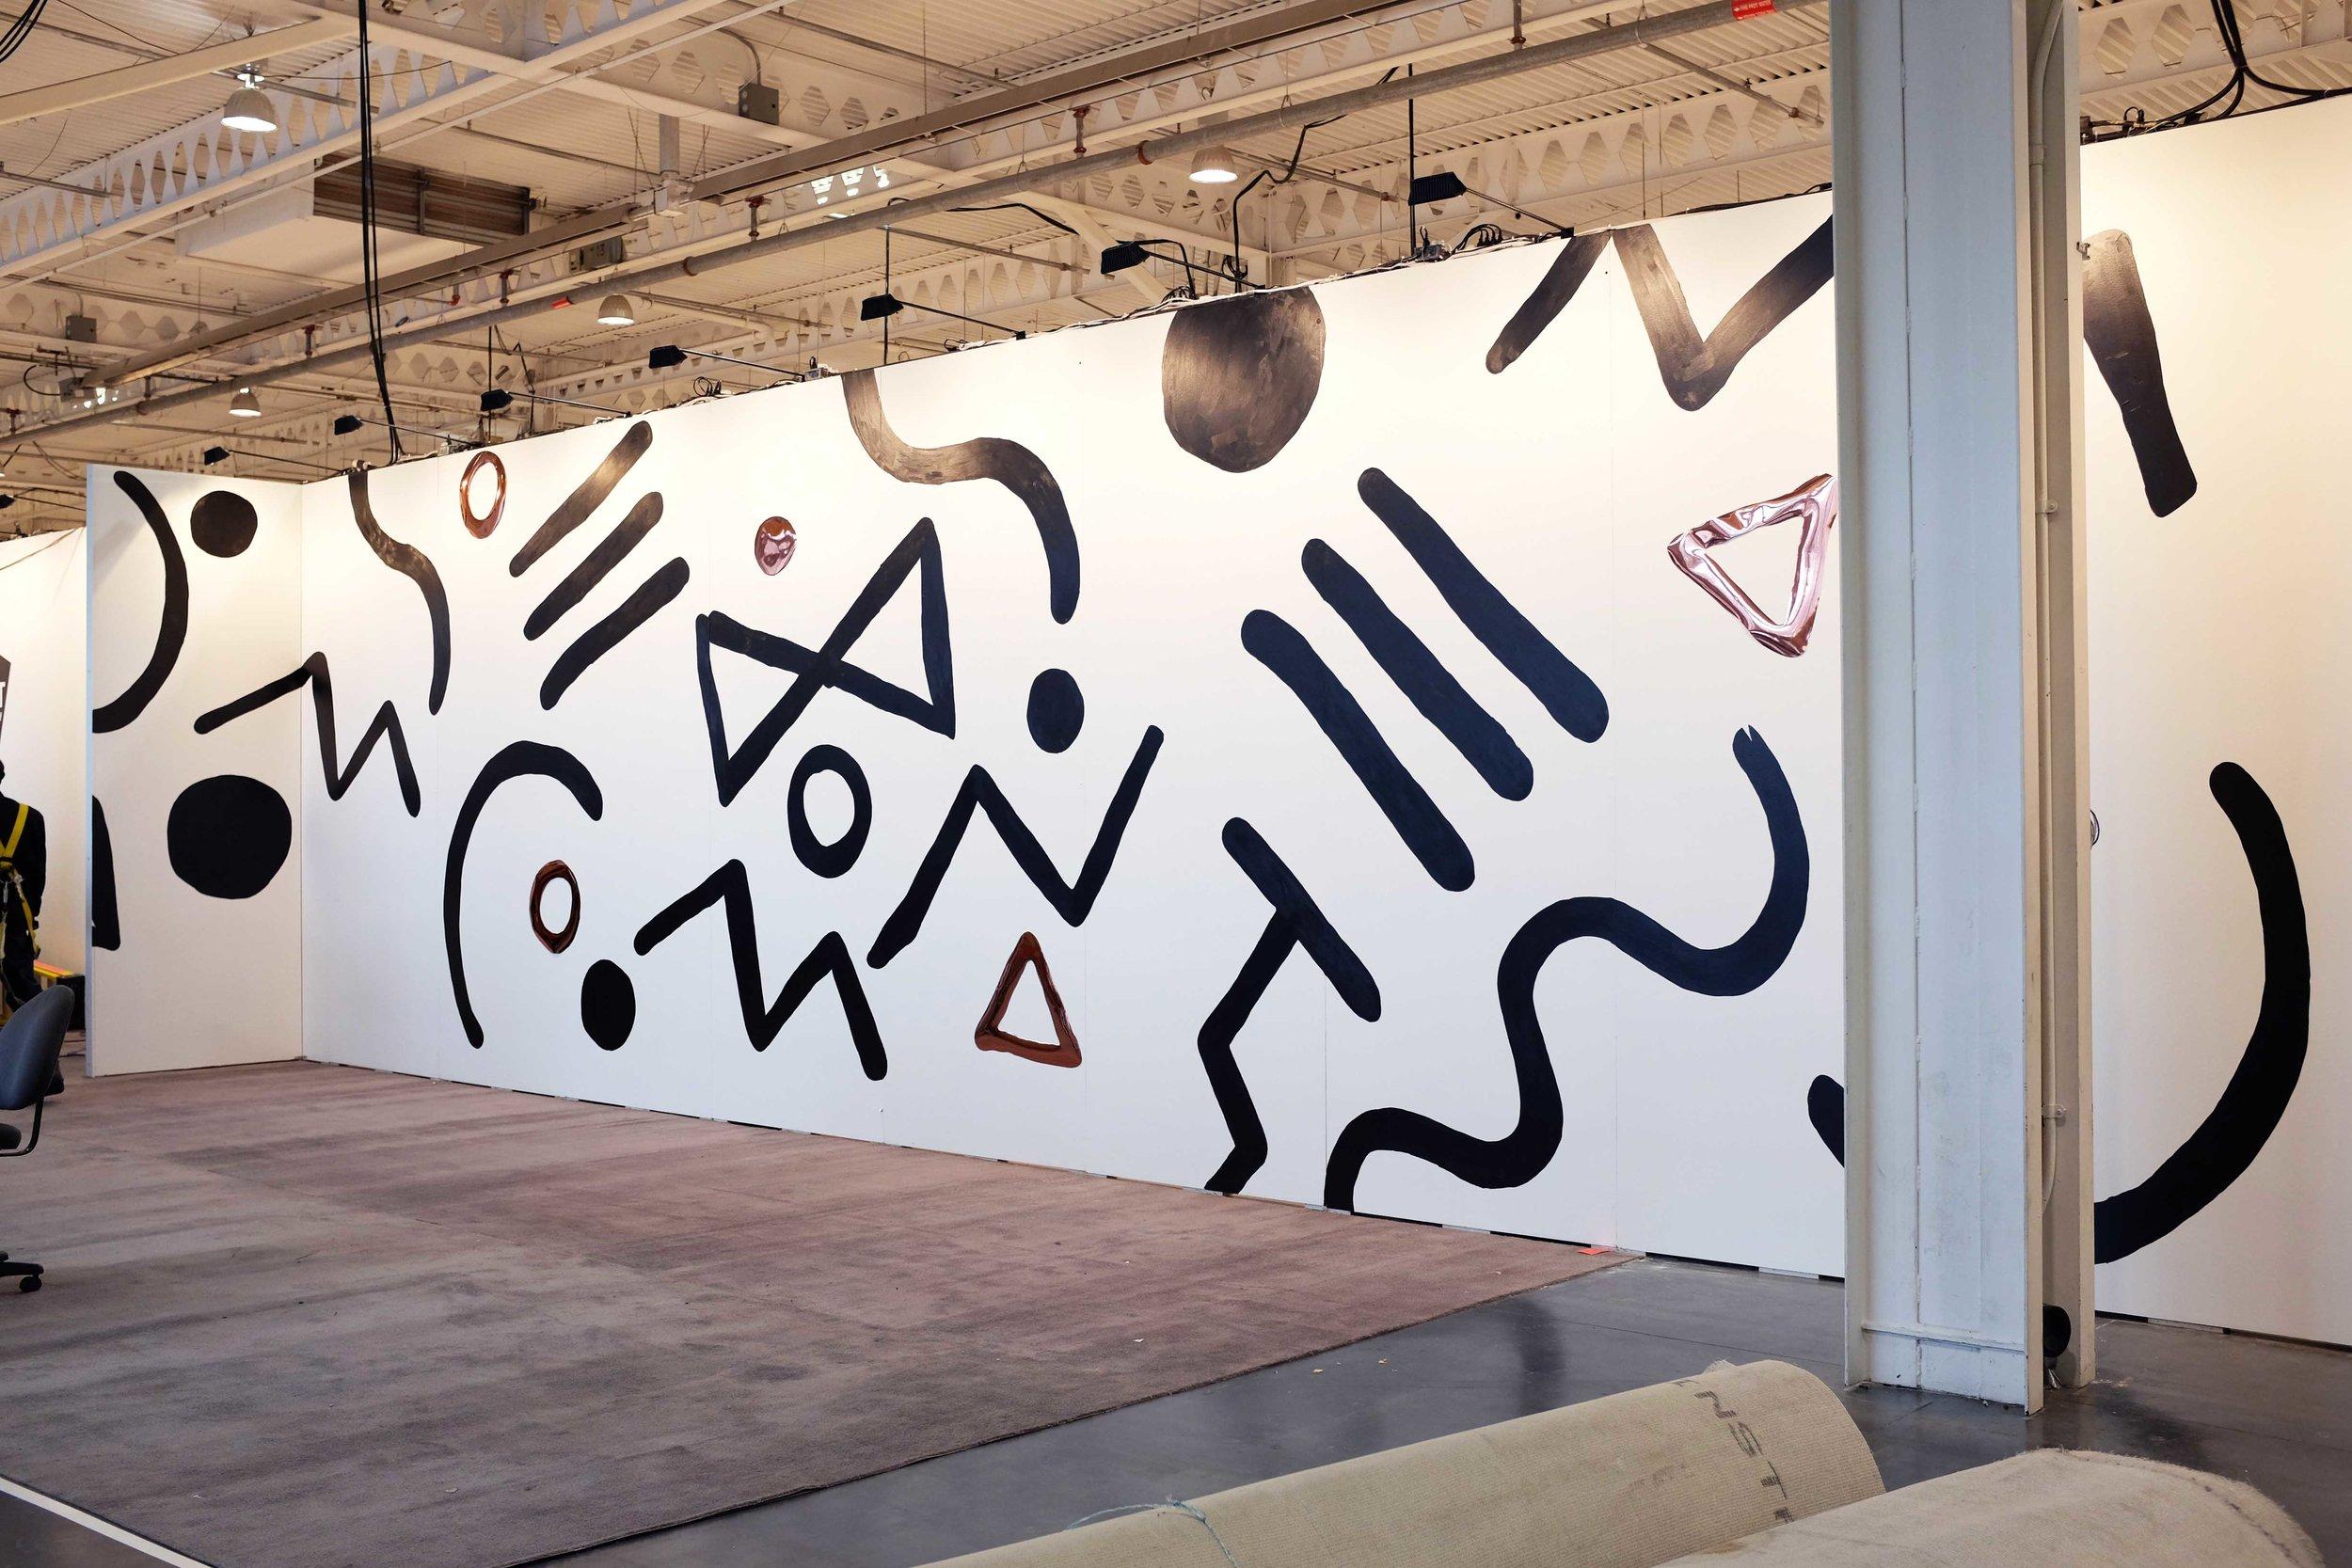 miss-cloudy-pauline-loctin-artist-project-2019-paper-art-origami-entrance-toronto-15.jpg